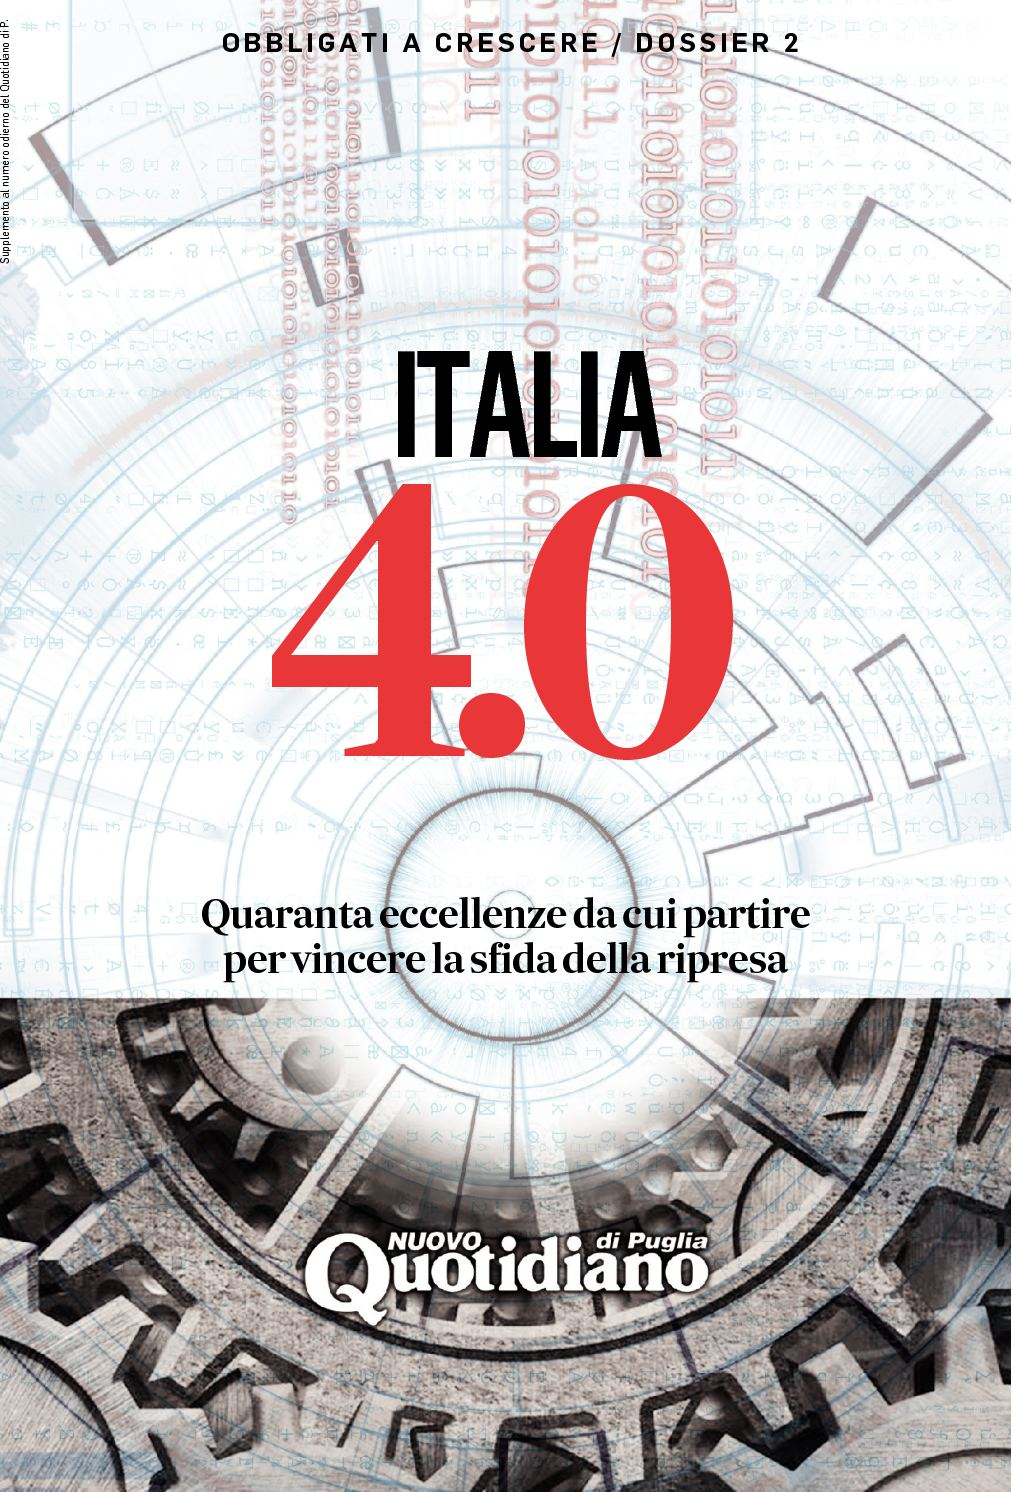 Calaméo - Quotidiano di Puglia 0a13a53b8d92